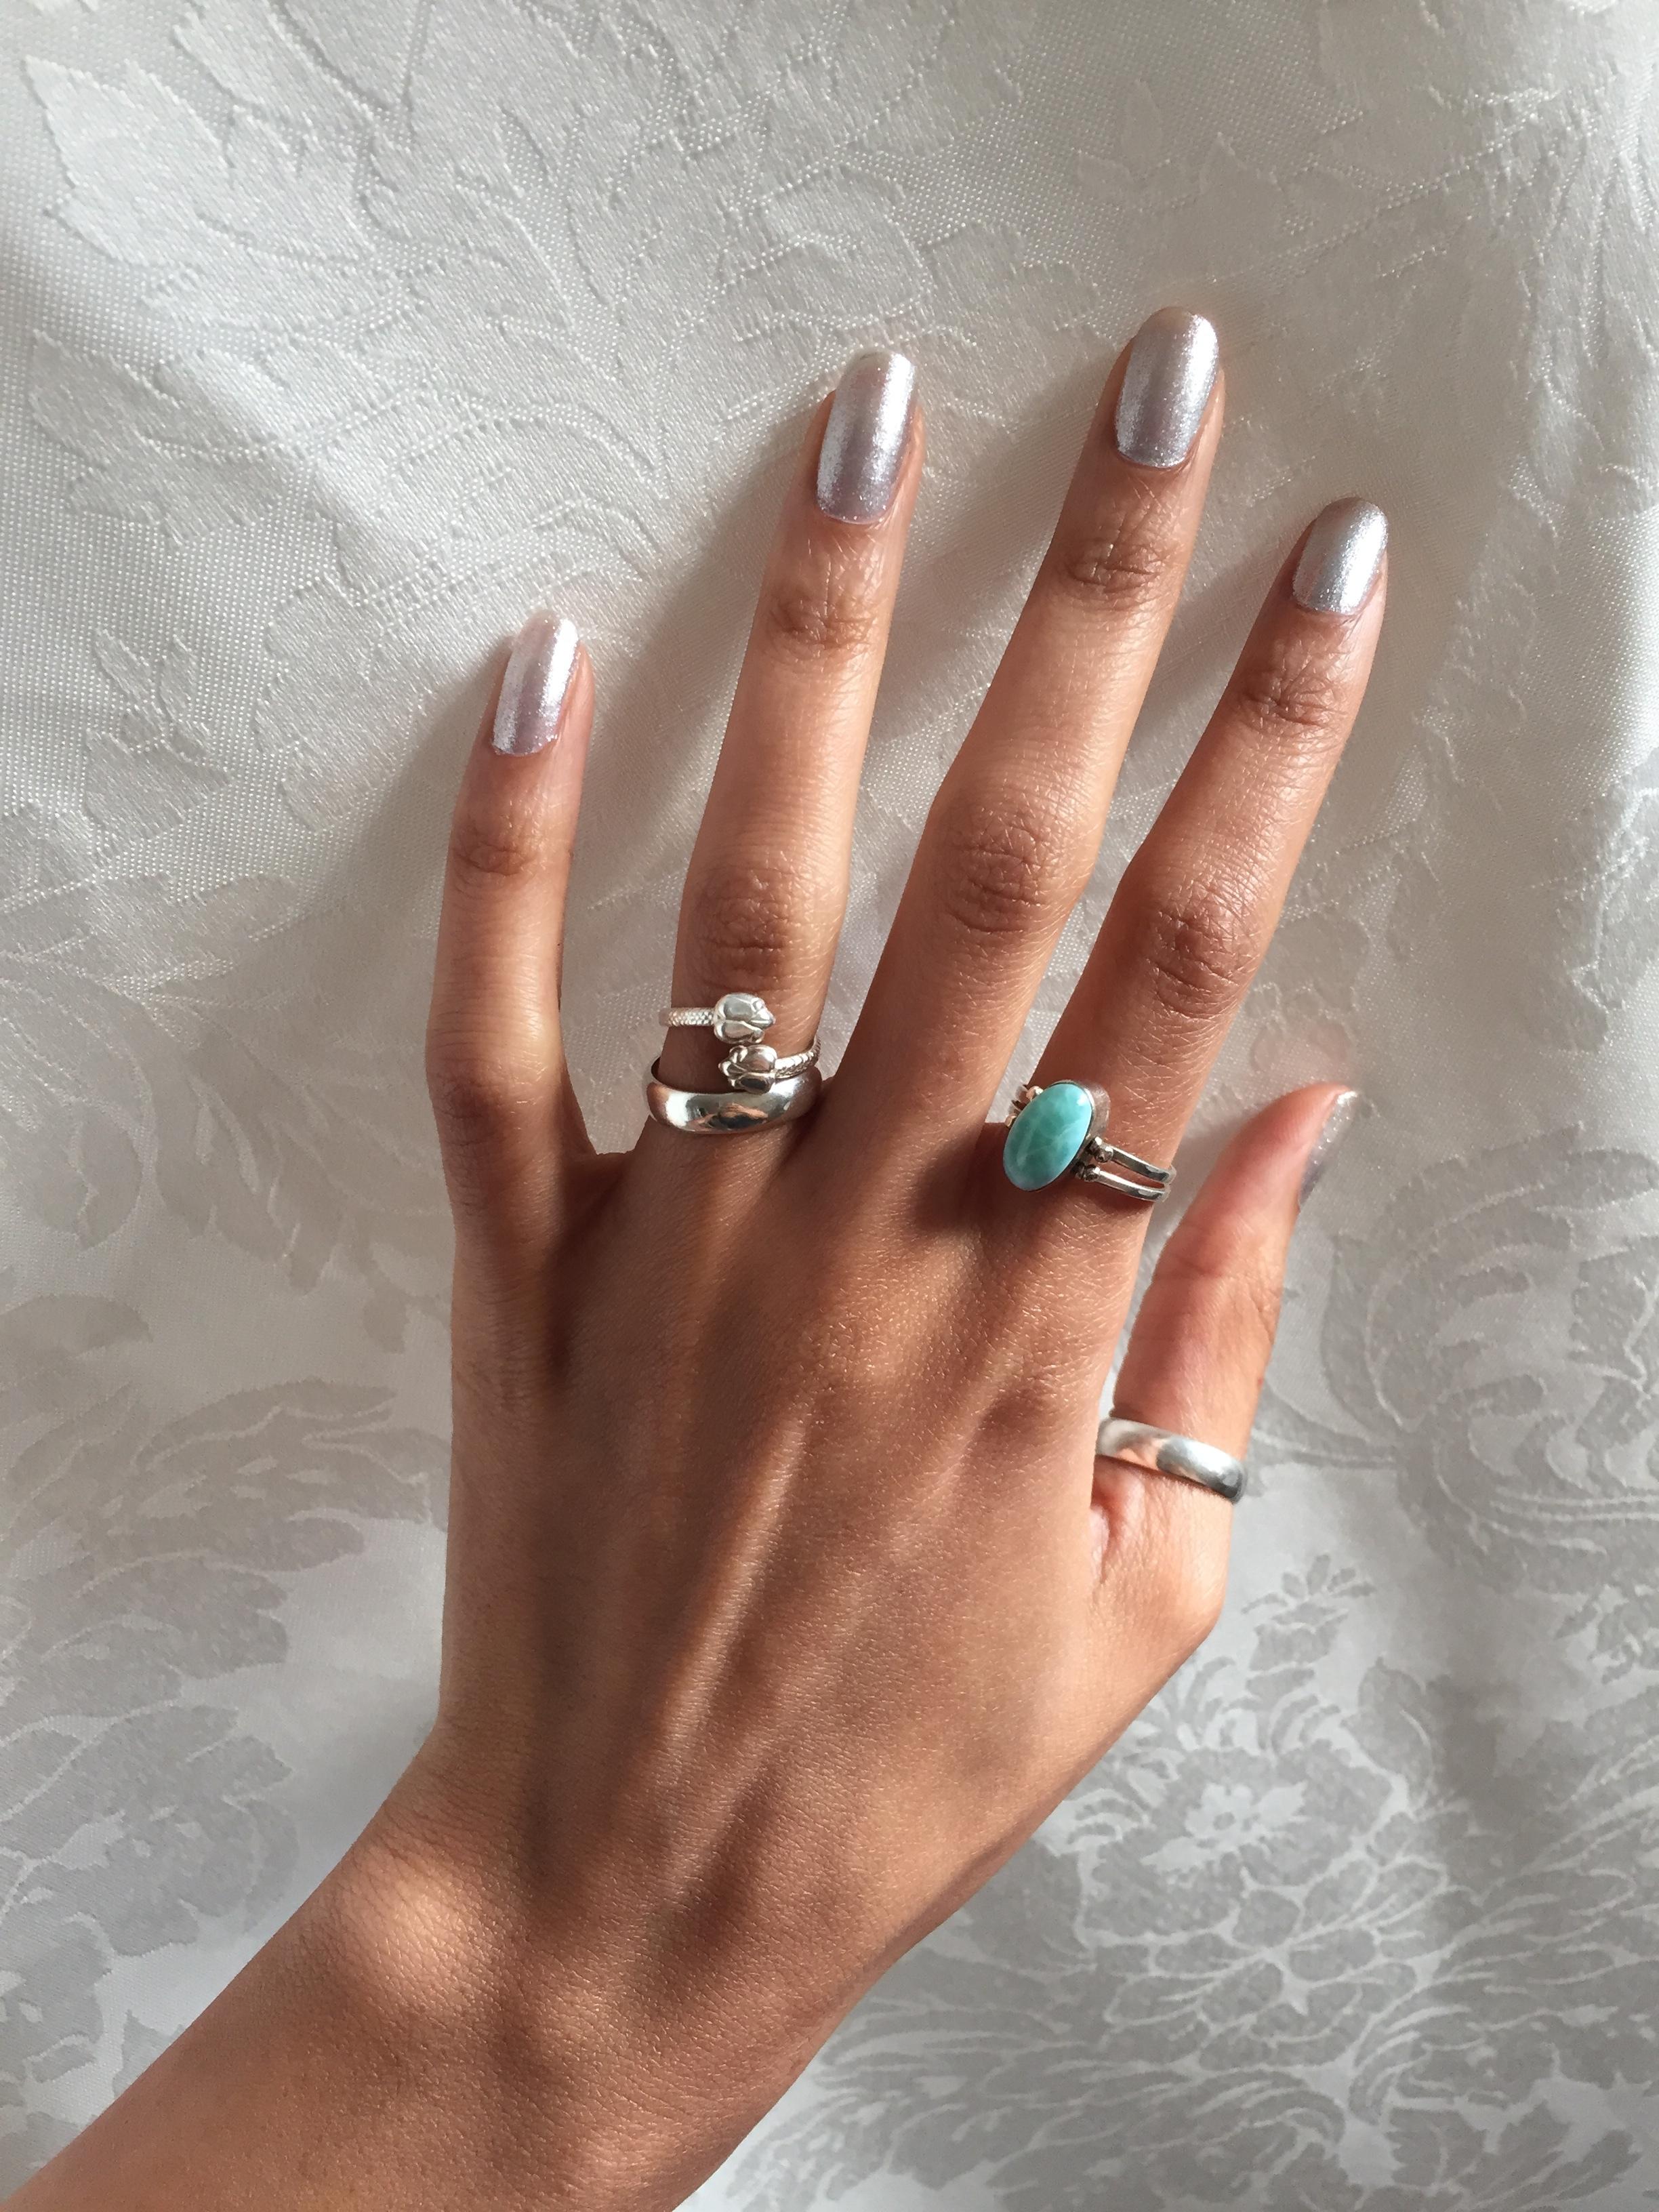 Rings: Dominican Republic, India, Venice